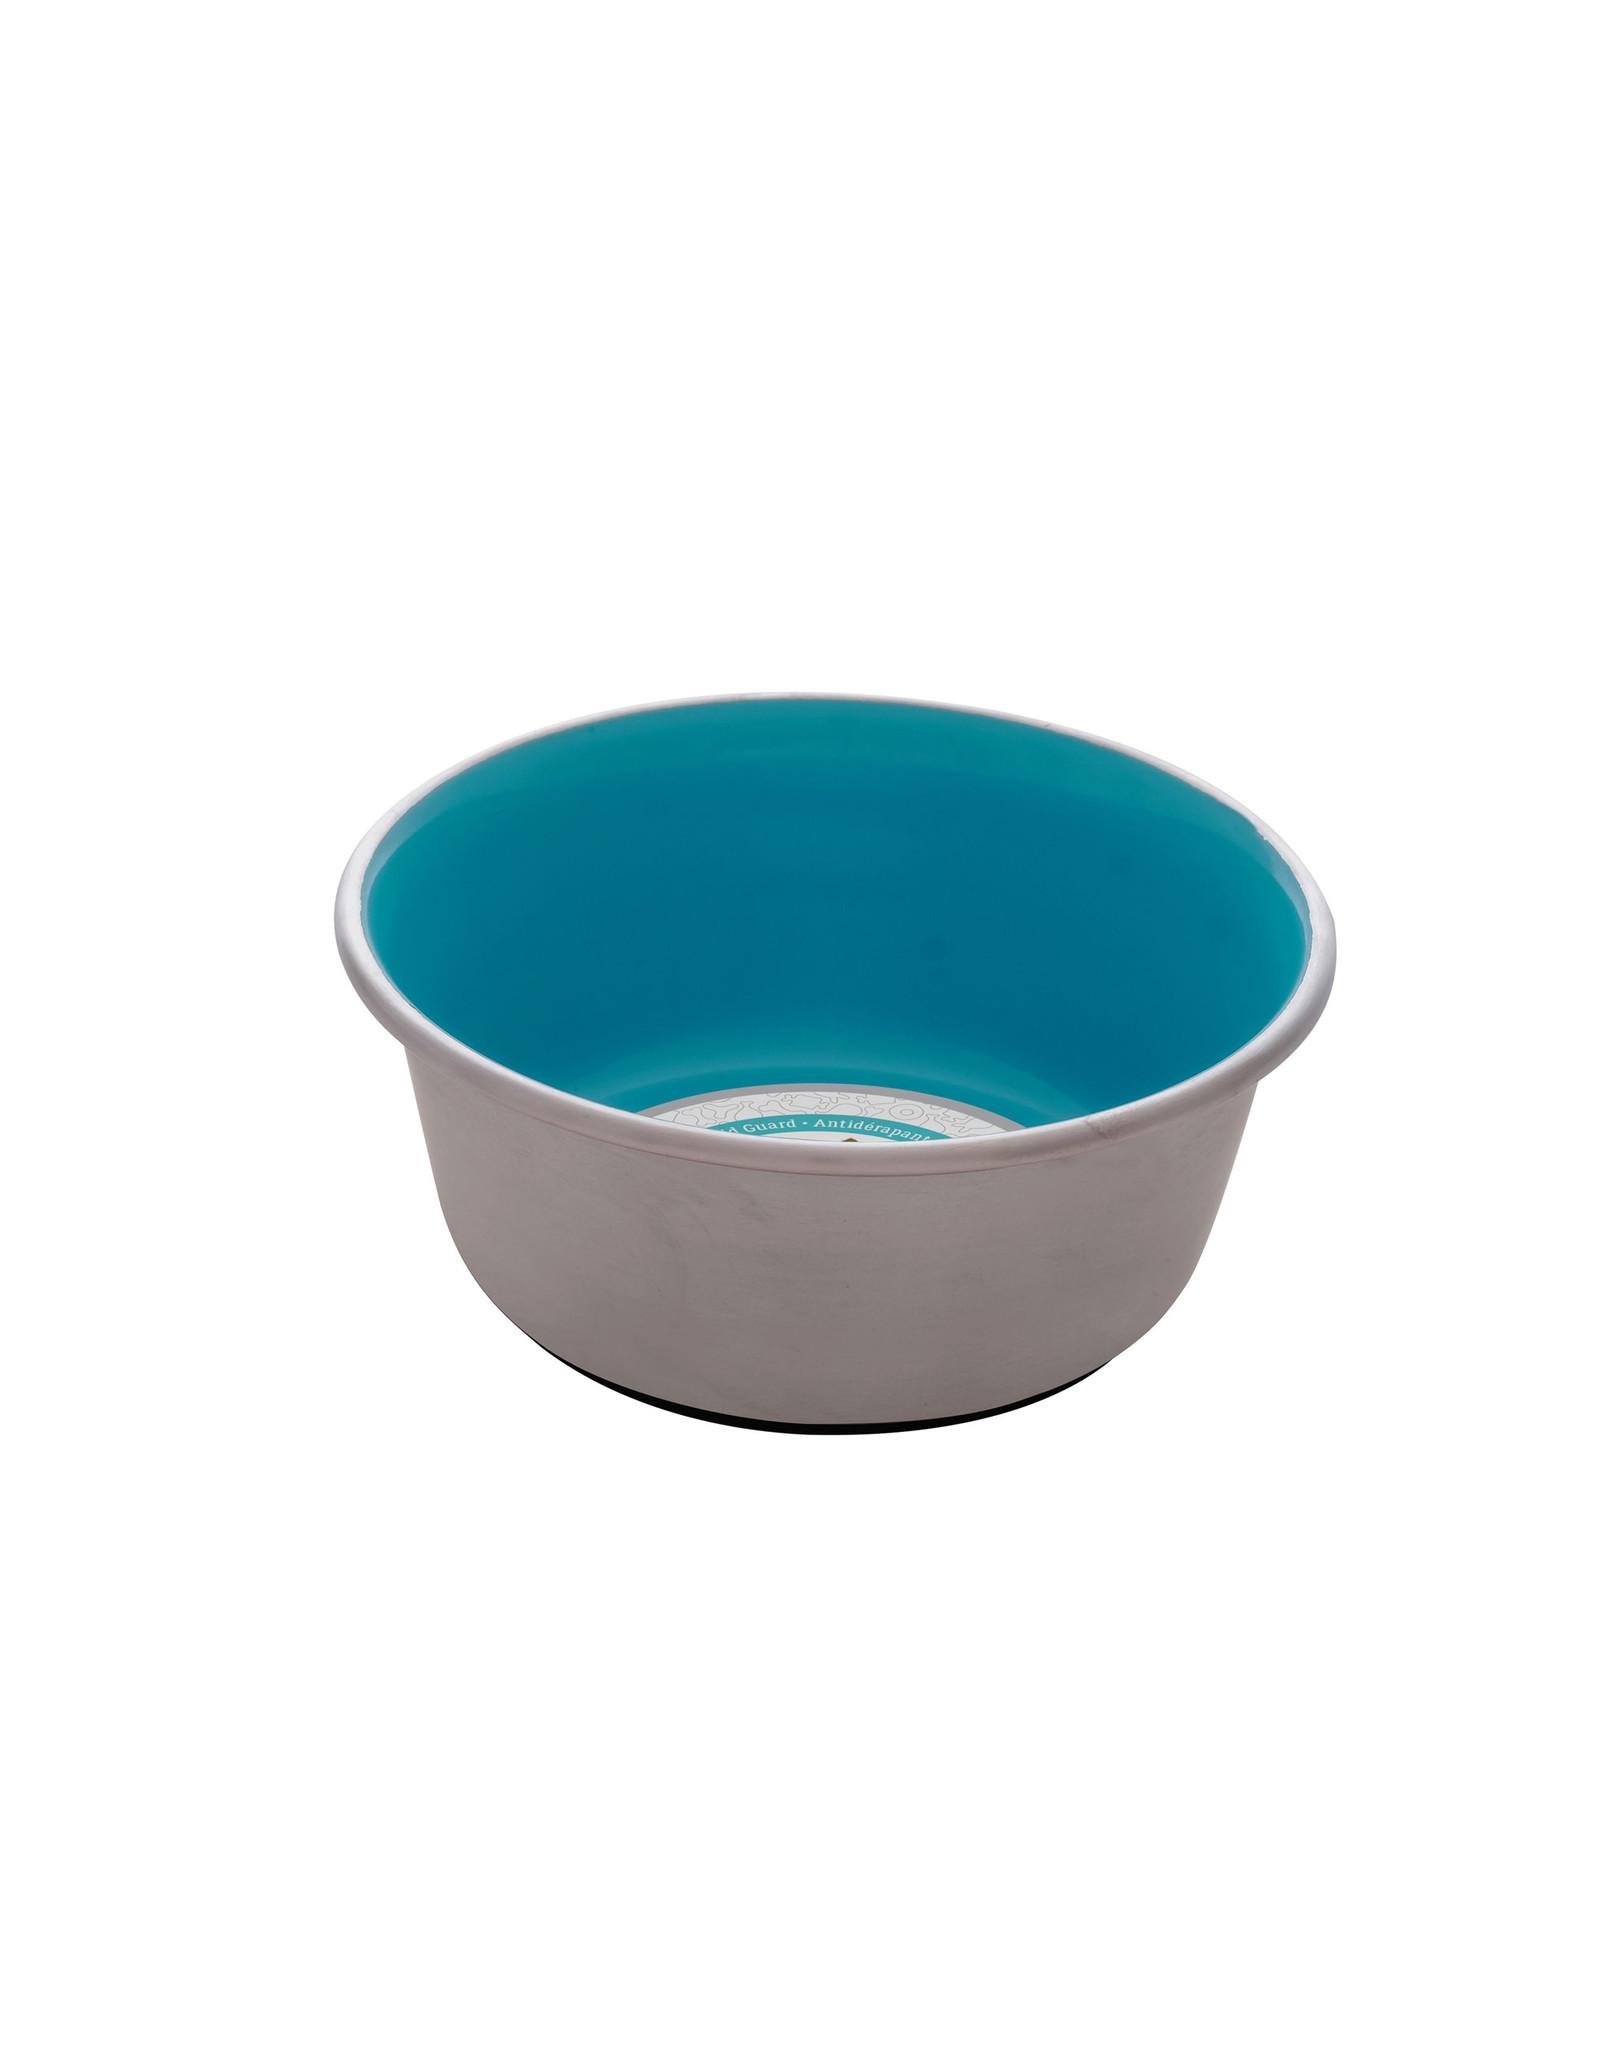 DO - Dogit Dogit Stainless Steel Non-Skid Dog Bowl